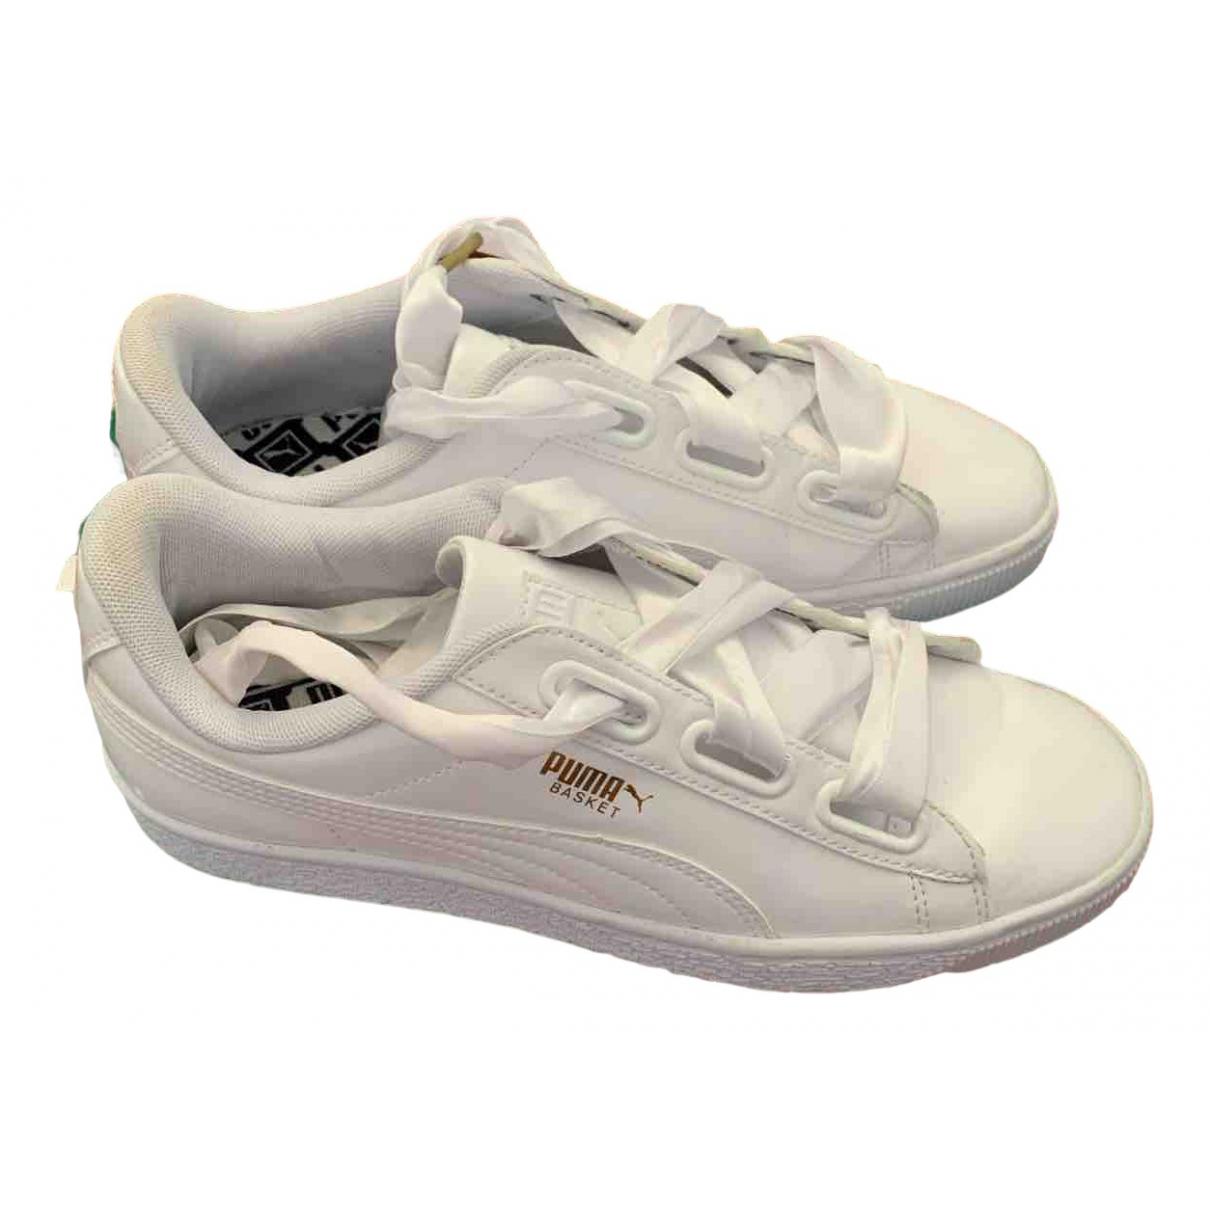 Puma \N Sneakers in  Weiss Kautschuk